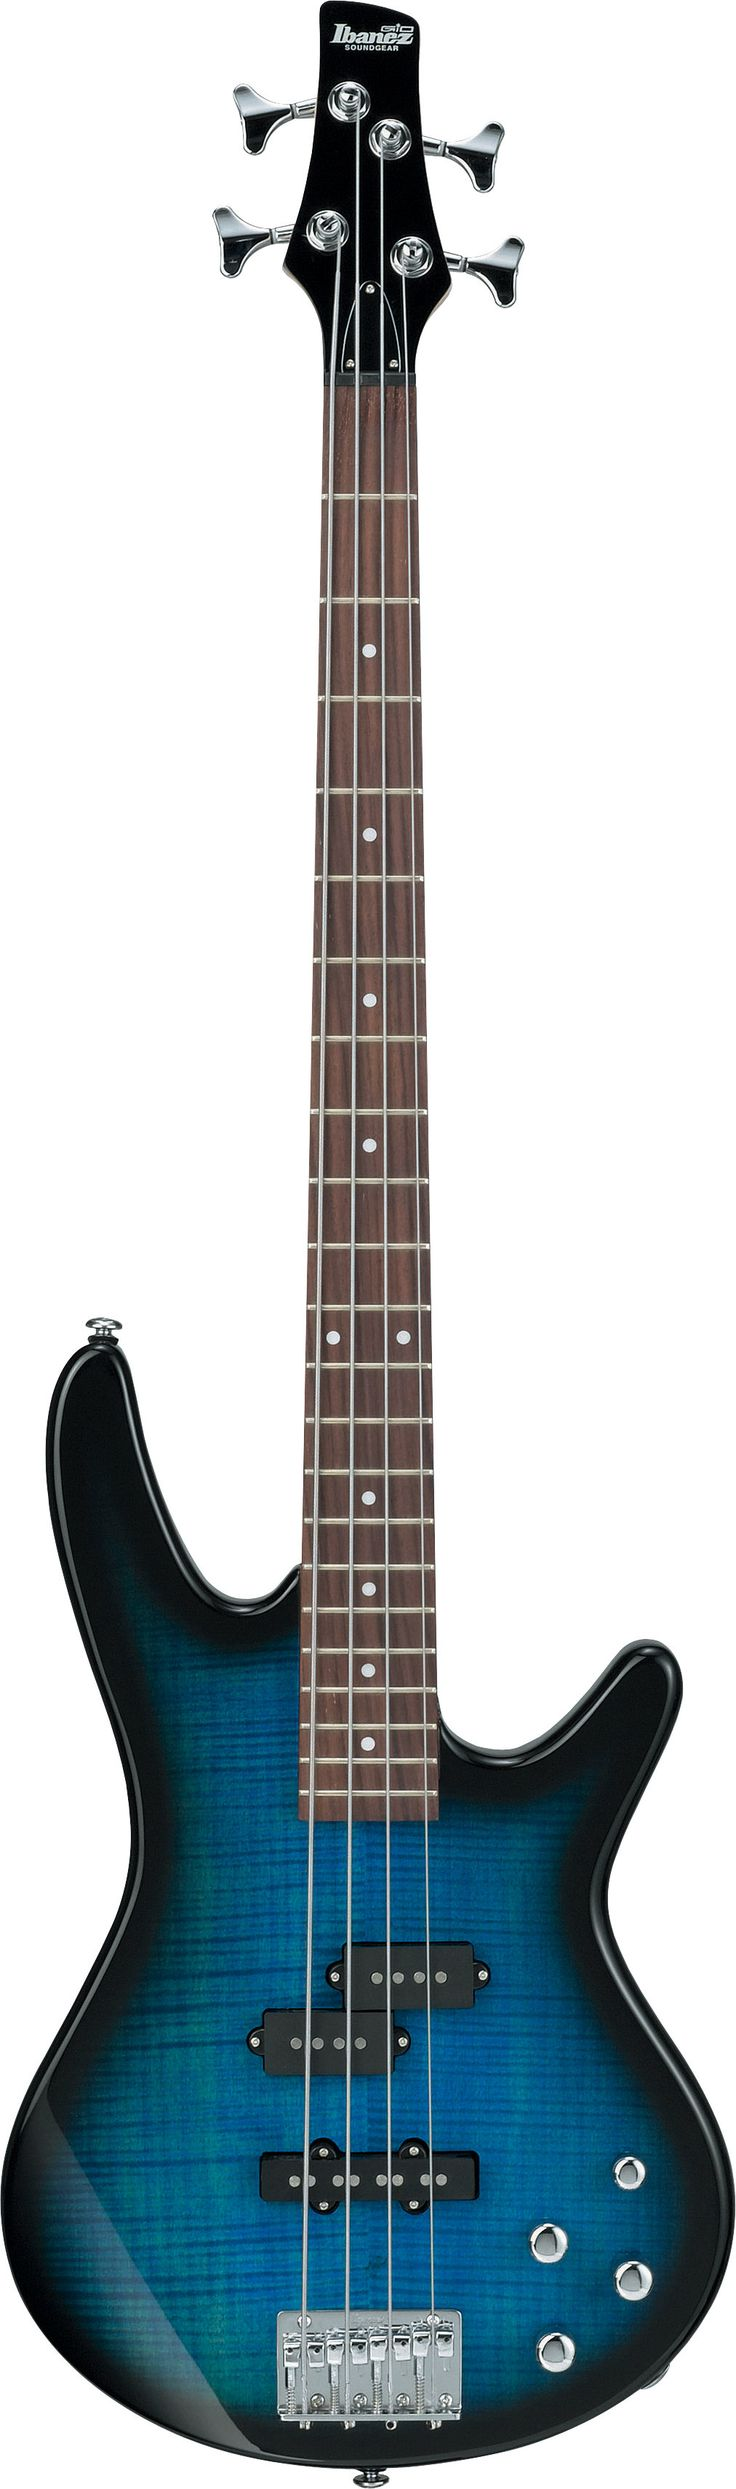 Transparent Blue Burst Ibanez GSR200FM Electric Bass    Again: Pretty.